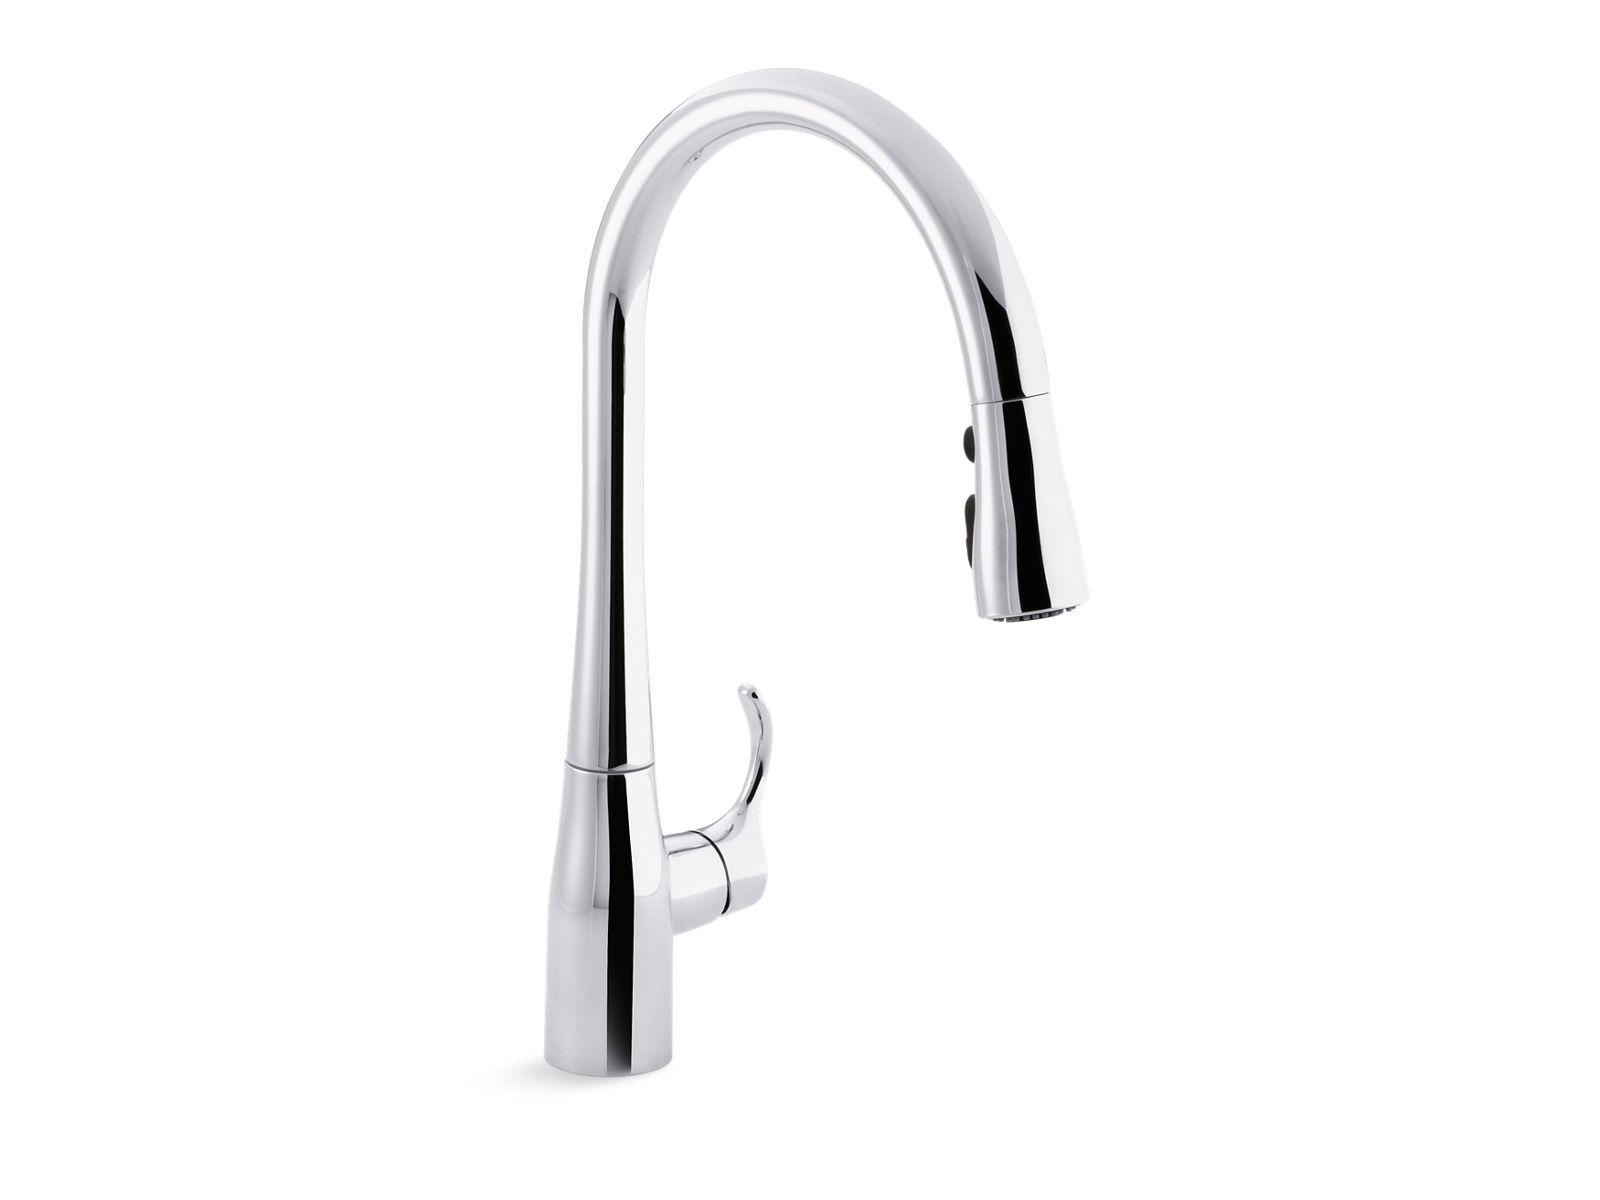 K 596 Simplice Single Handle Kitchen Sink Faucet Kohler In